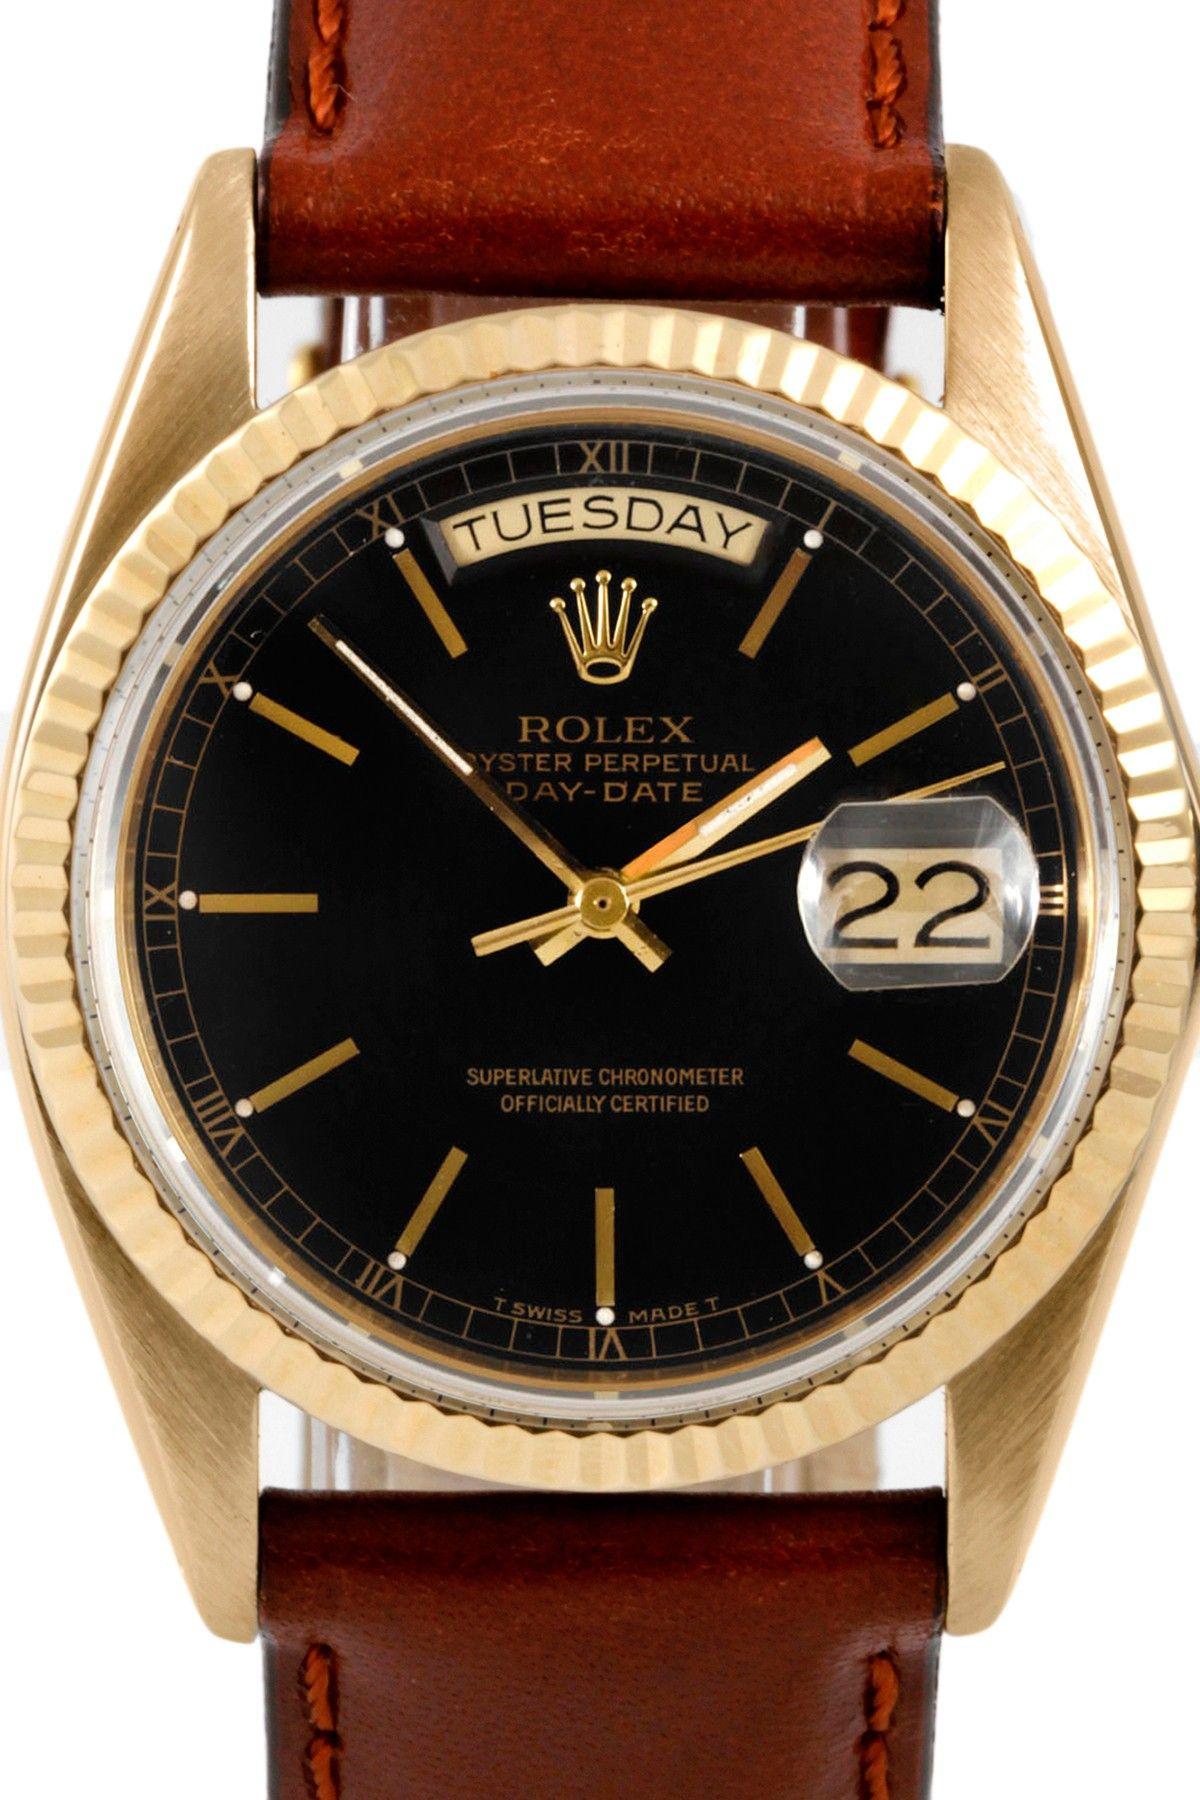 Vintage Lujo Y Caballero RolexRelojes RelojDe n0Nvm8wyOP